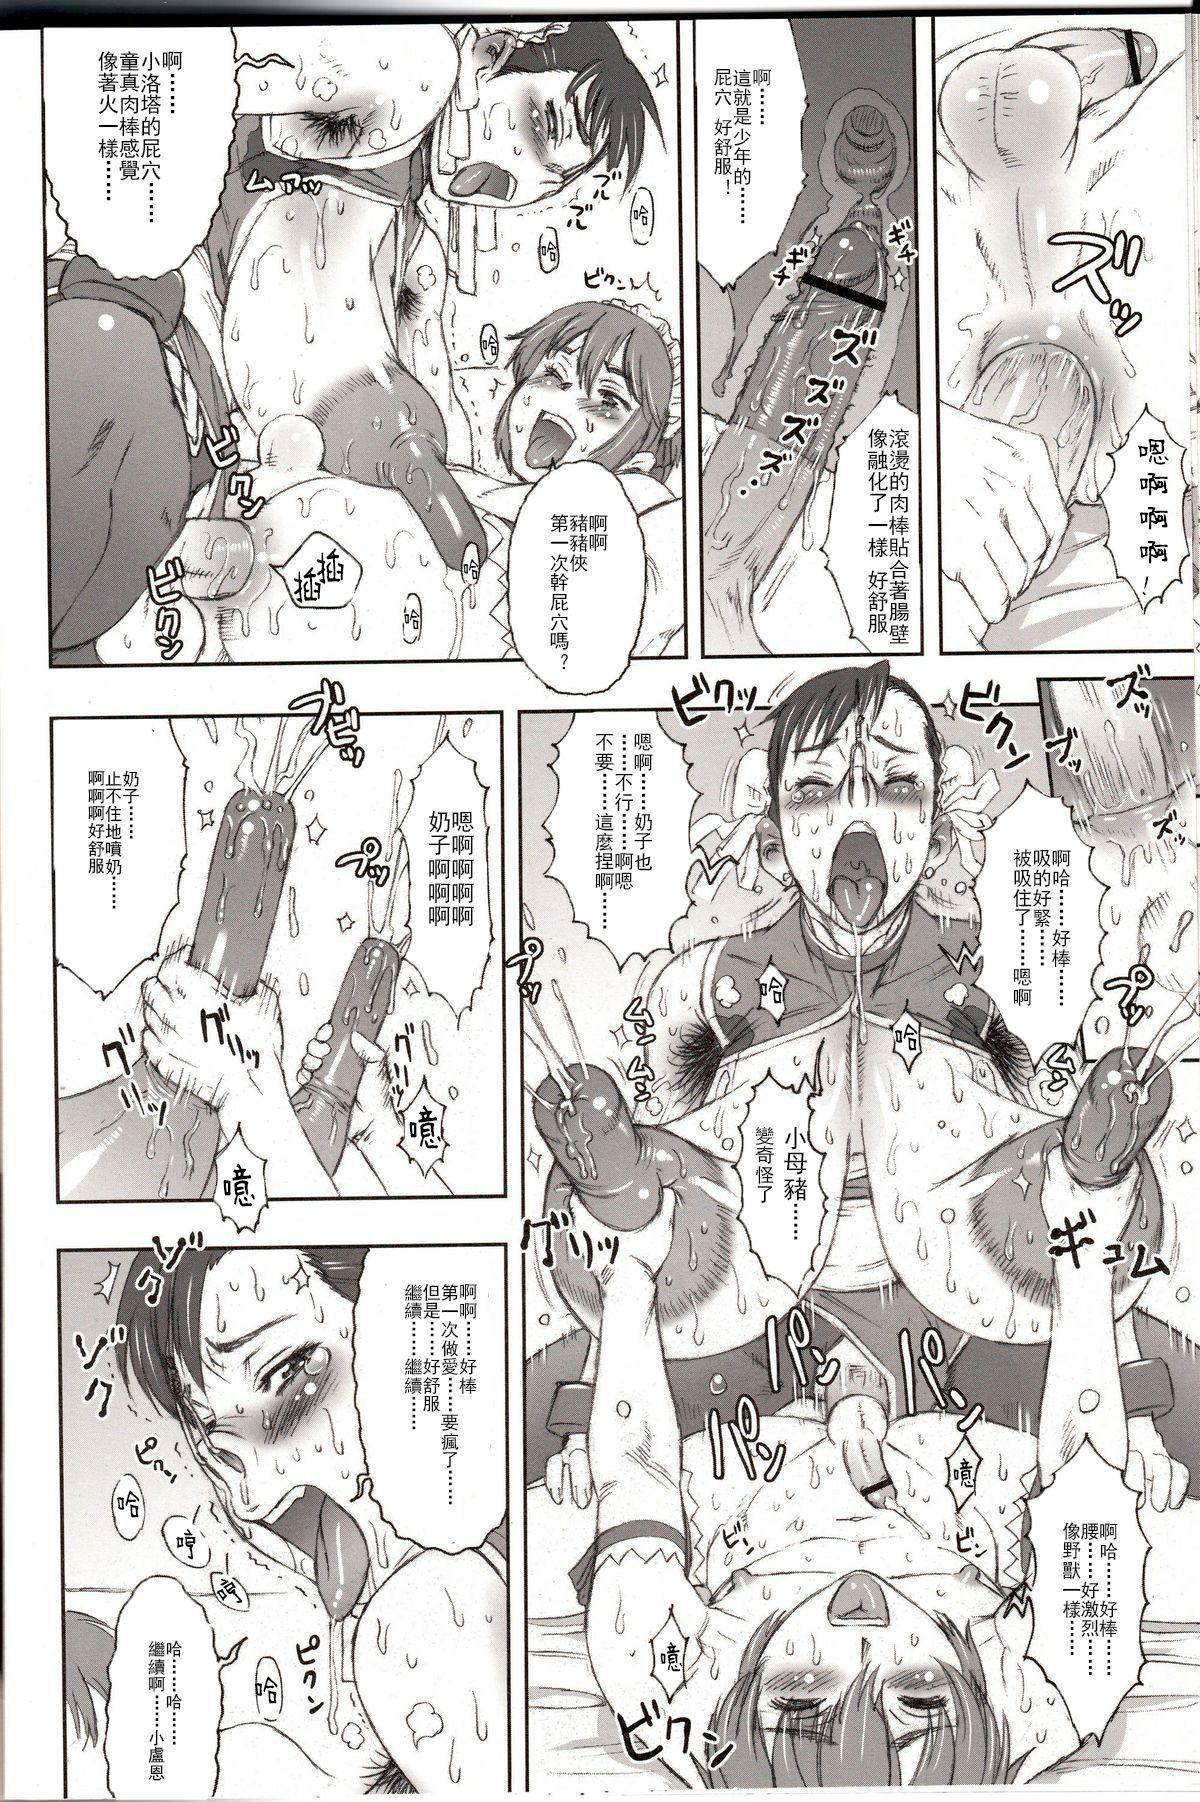 (C70) [Niku Ringo (Kakugari Kyoudai)] NIPPON Onna HEROINE 2 (Darkstalkers, Street Fighter II)[Chinese]【不可视汉化】 24